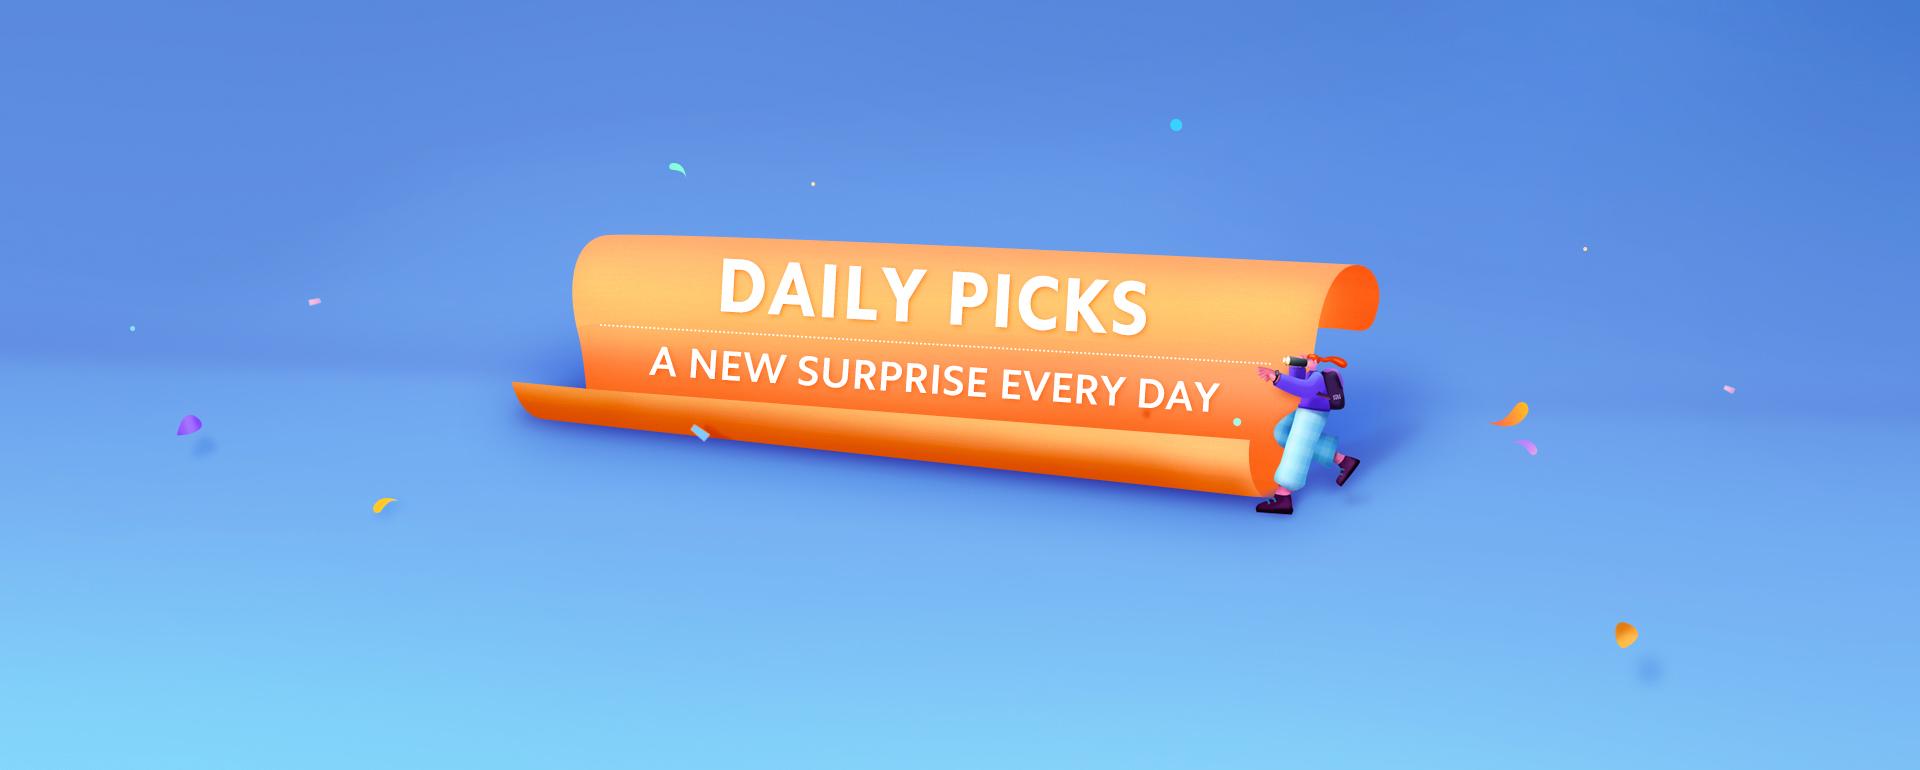 Daily Picks